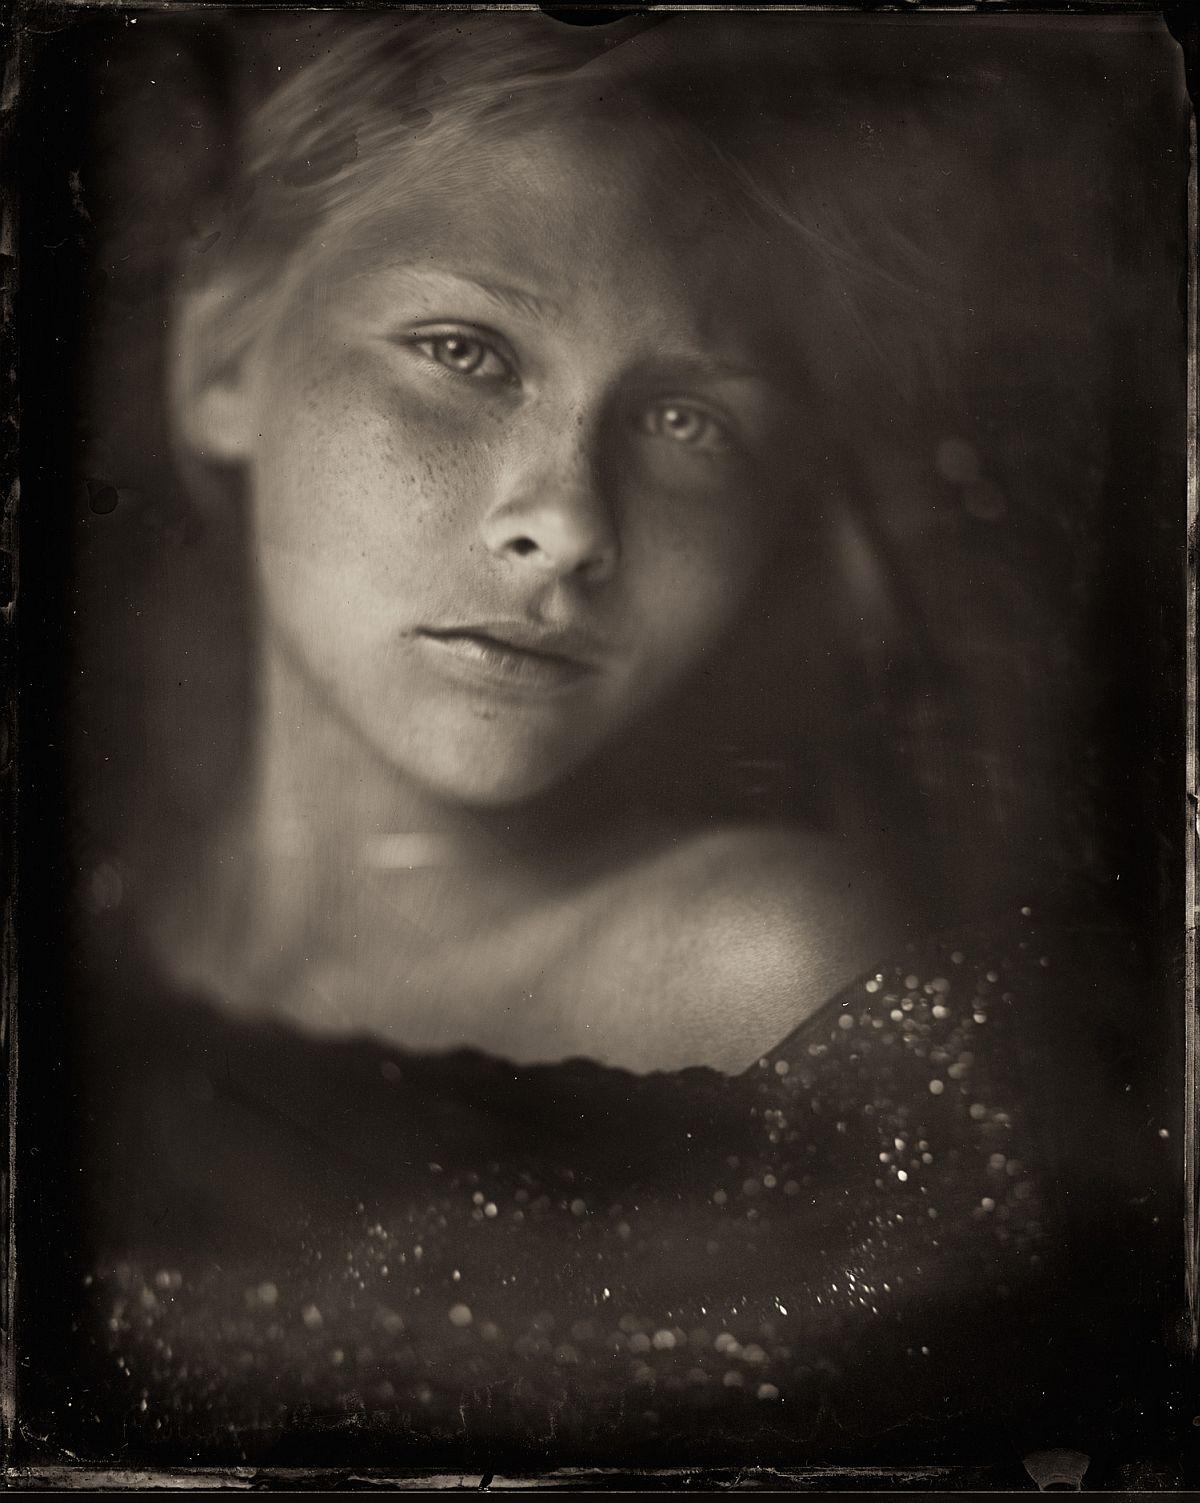 jacqueline-roberts-nebula-03